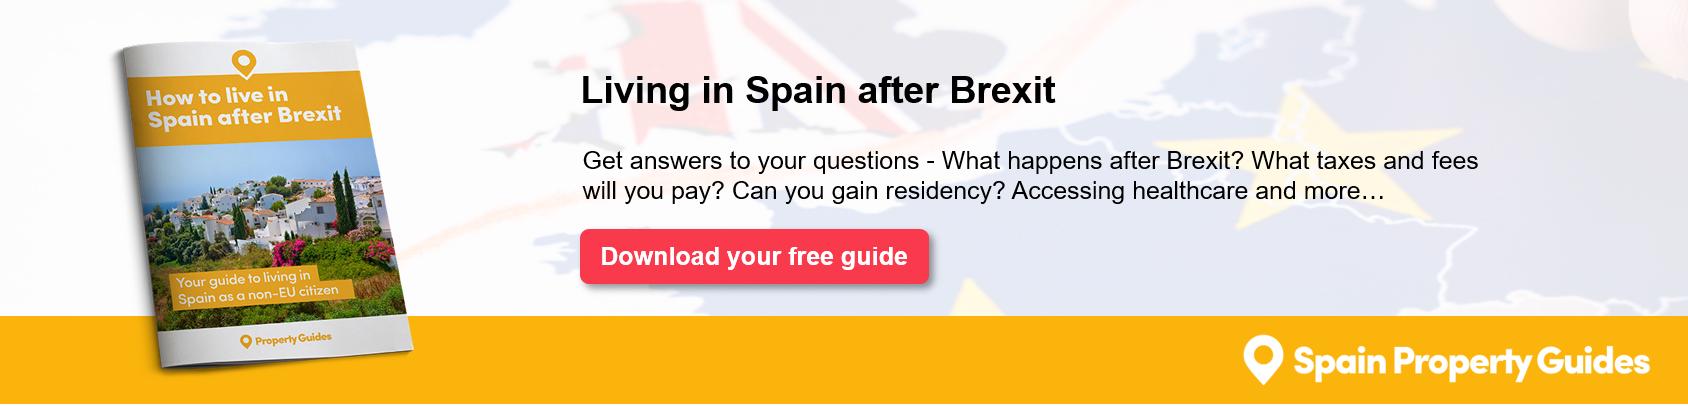 Brexit guide